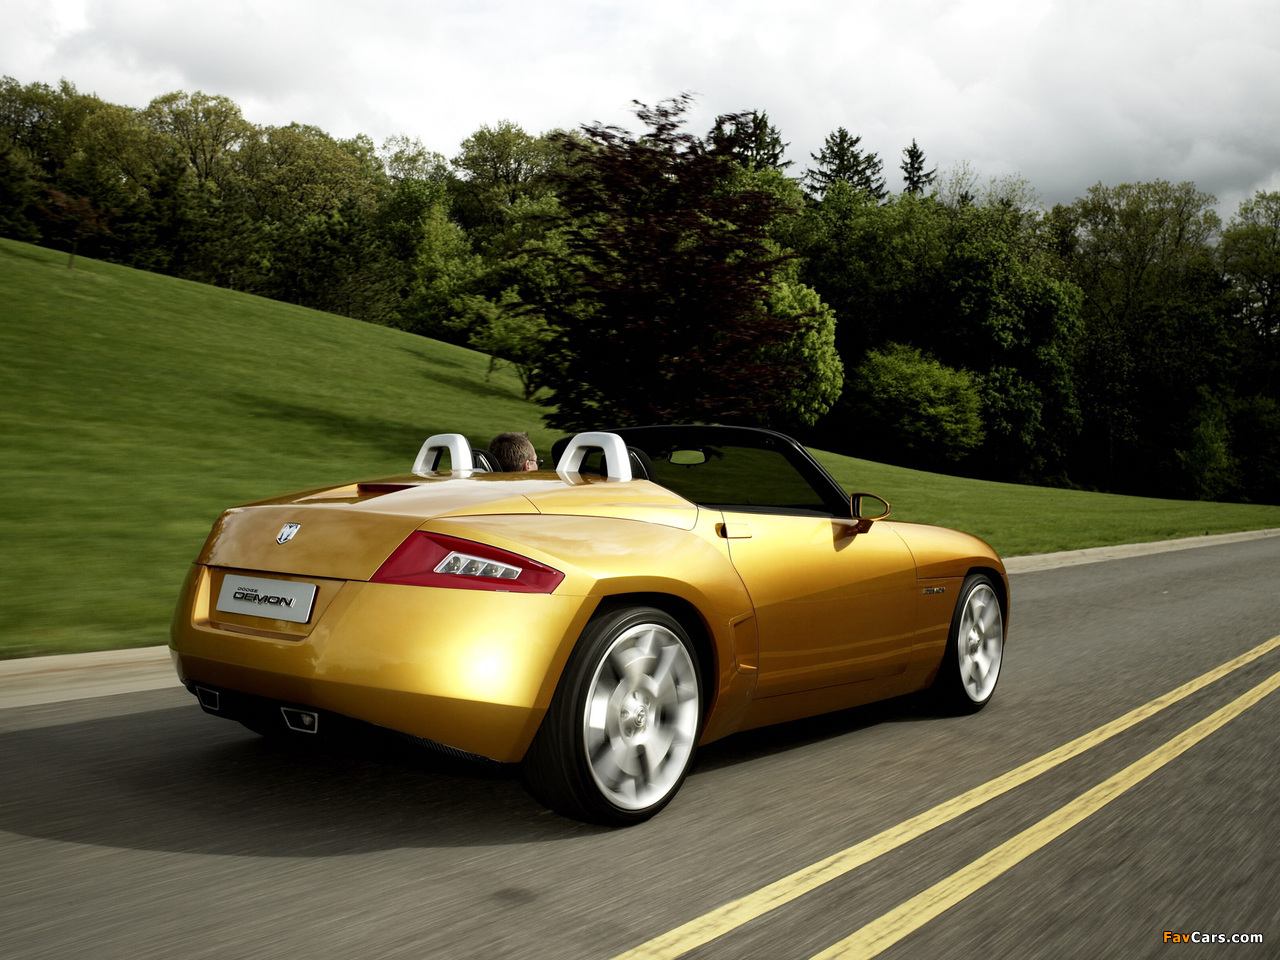 Dodge Demon Roadster Concept 2007 pictures (1280 x 960)